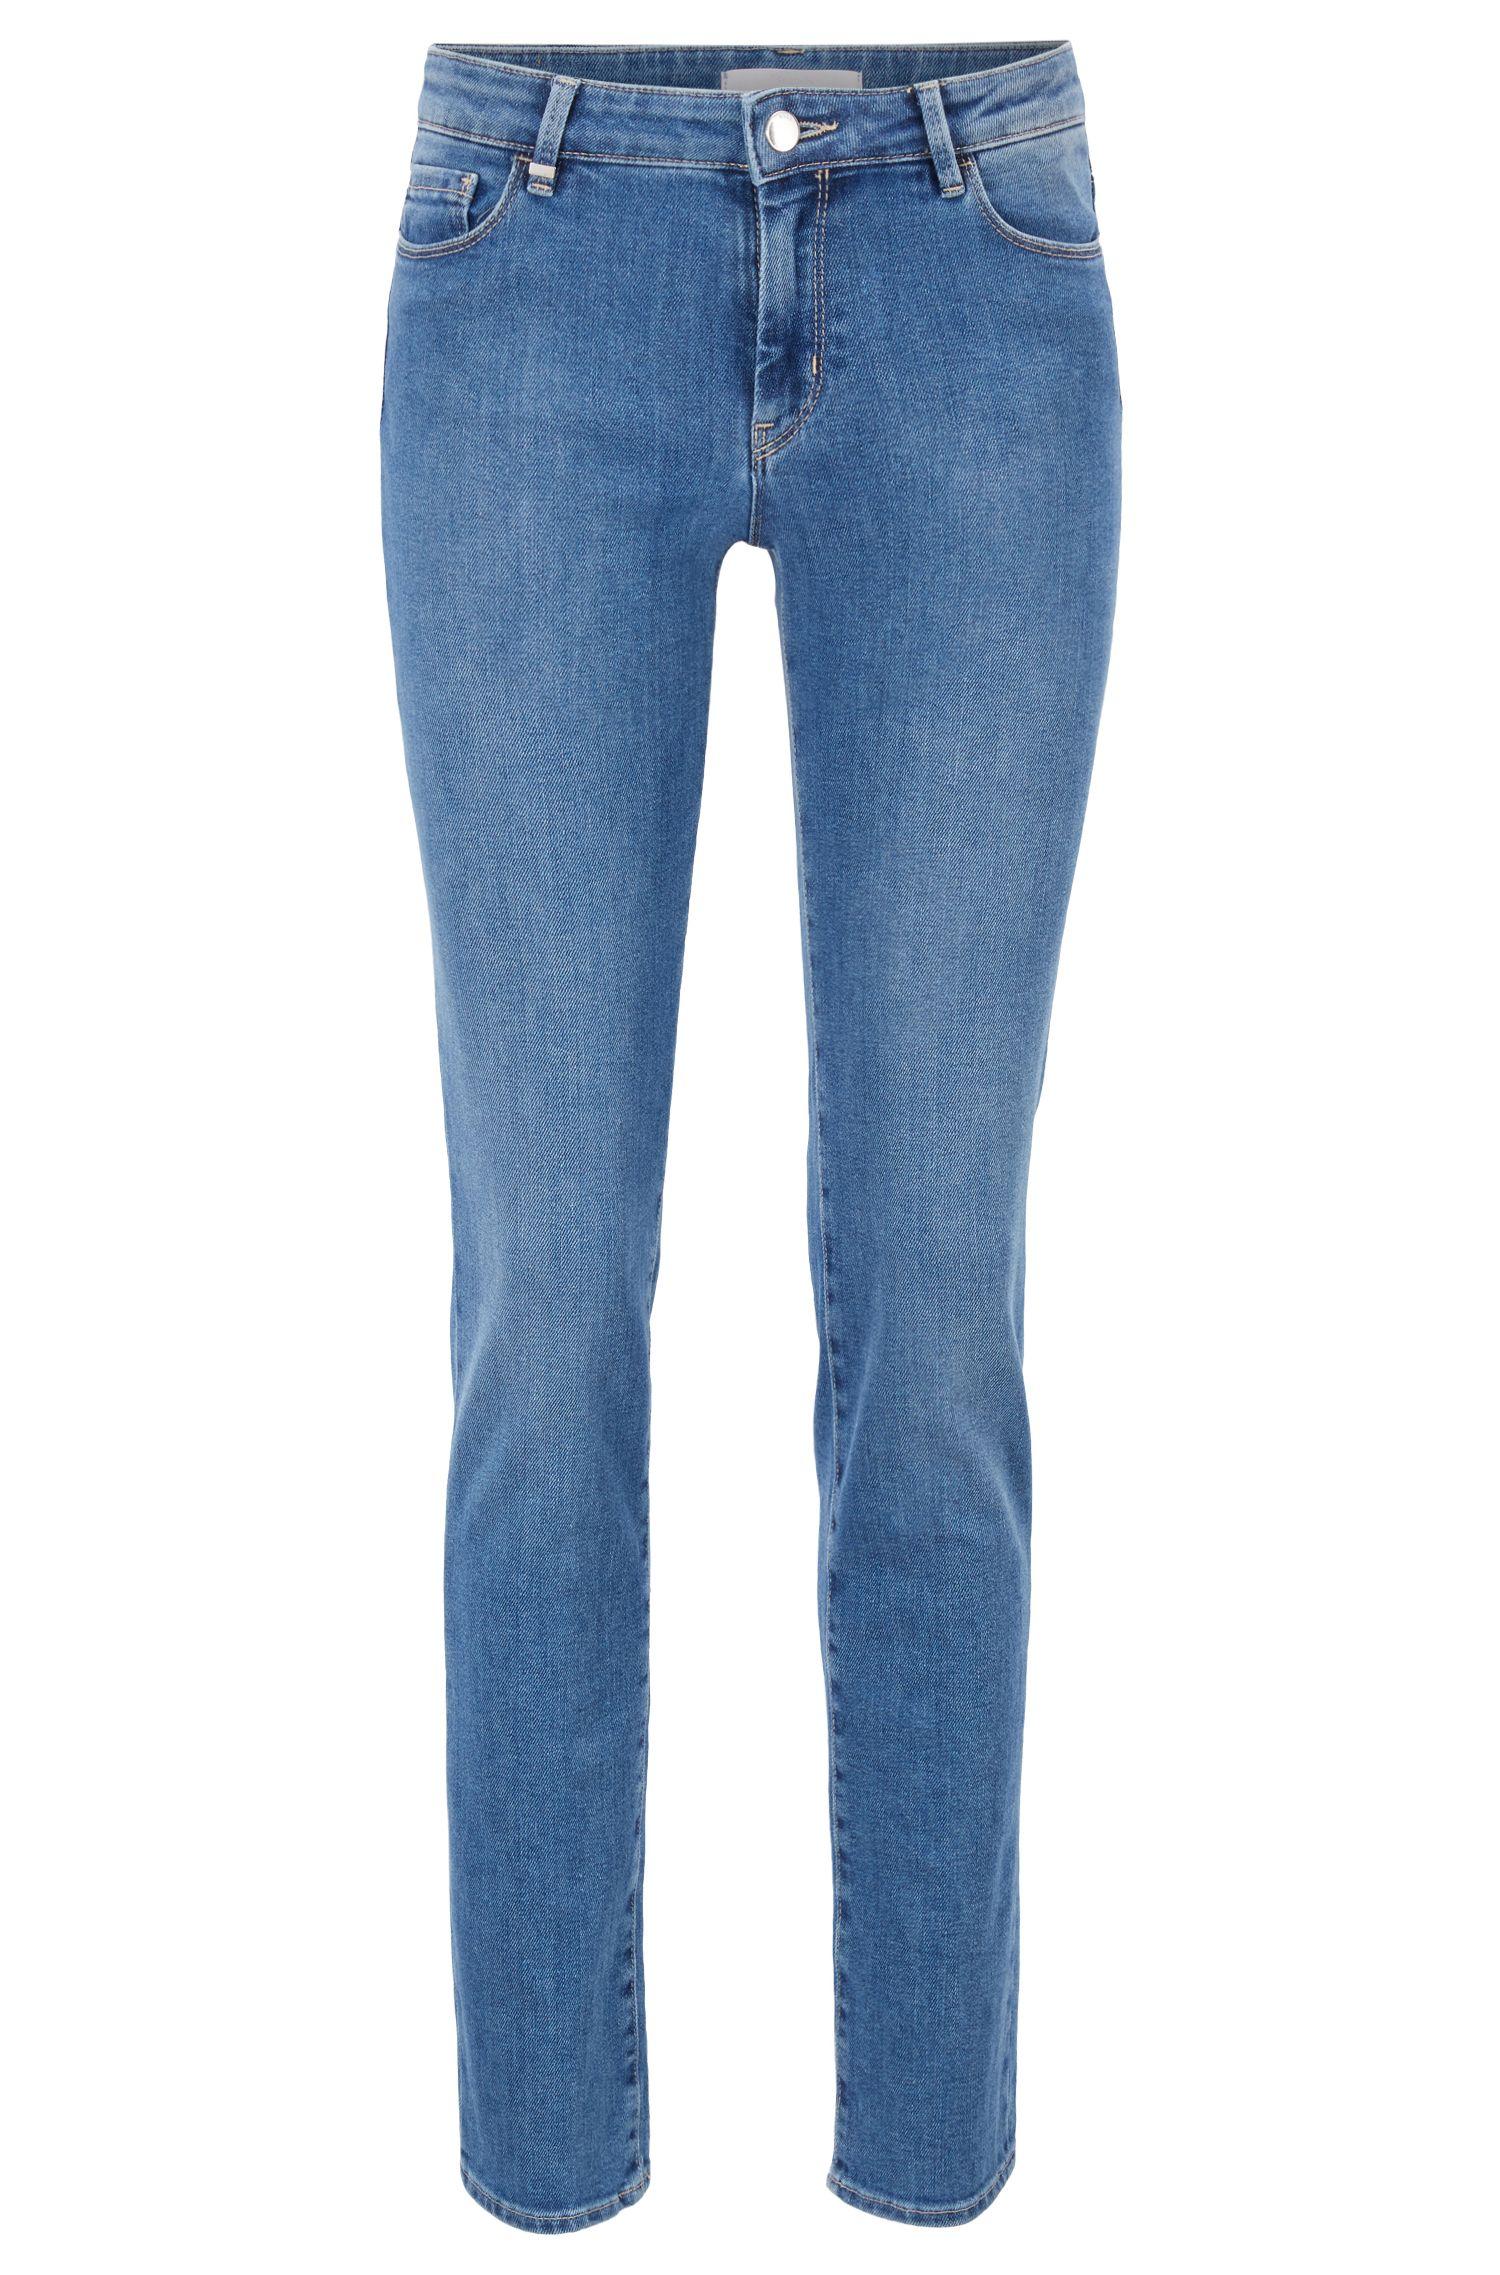 Jean Slim Fit en denim stretch confortable bleu, Bleu